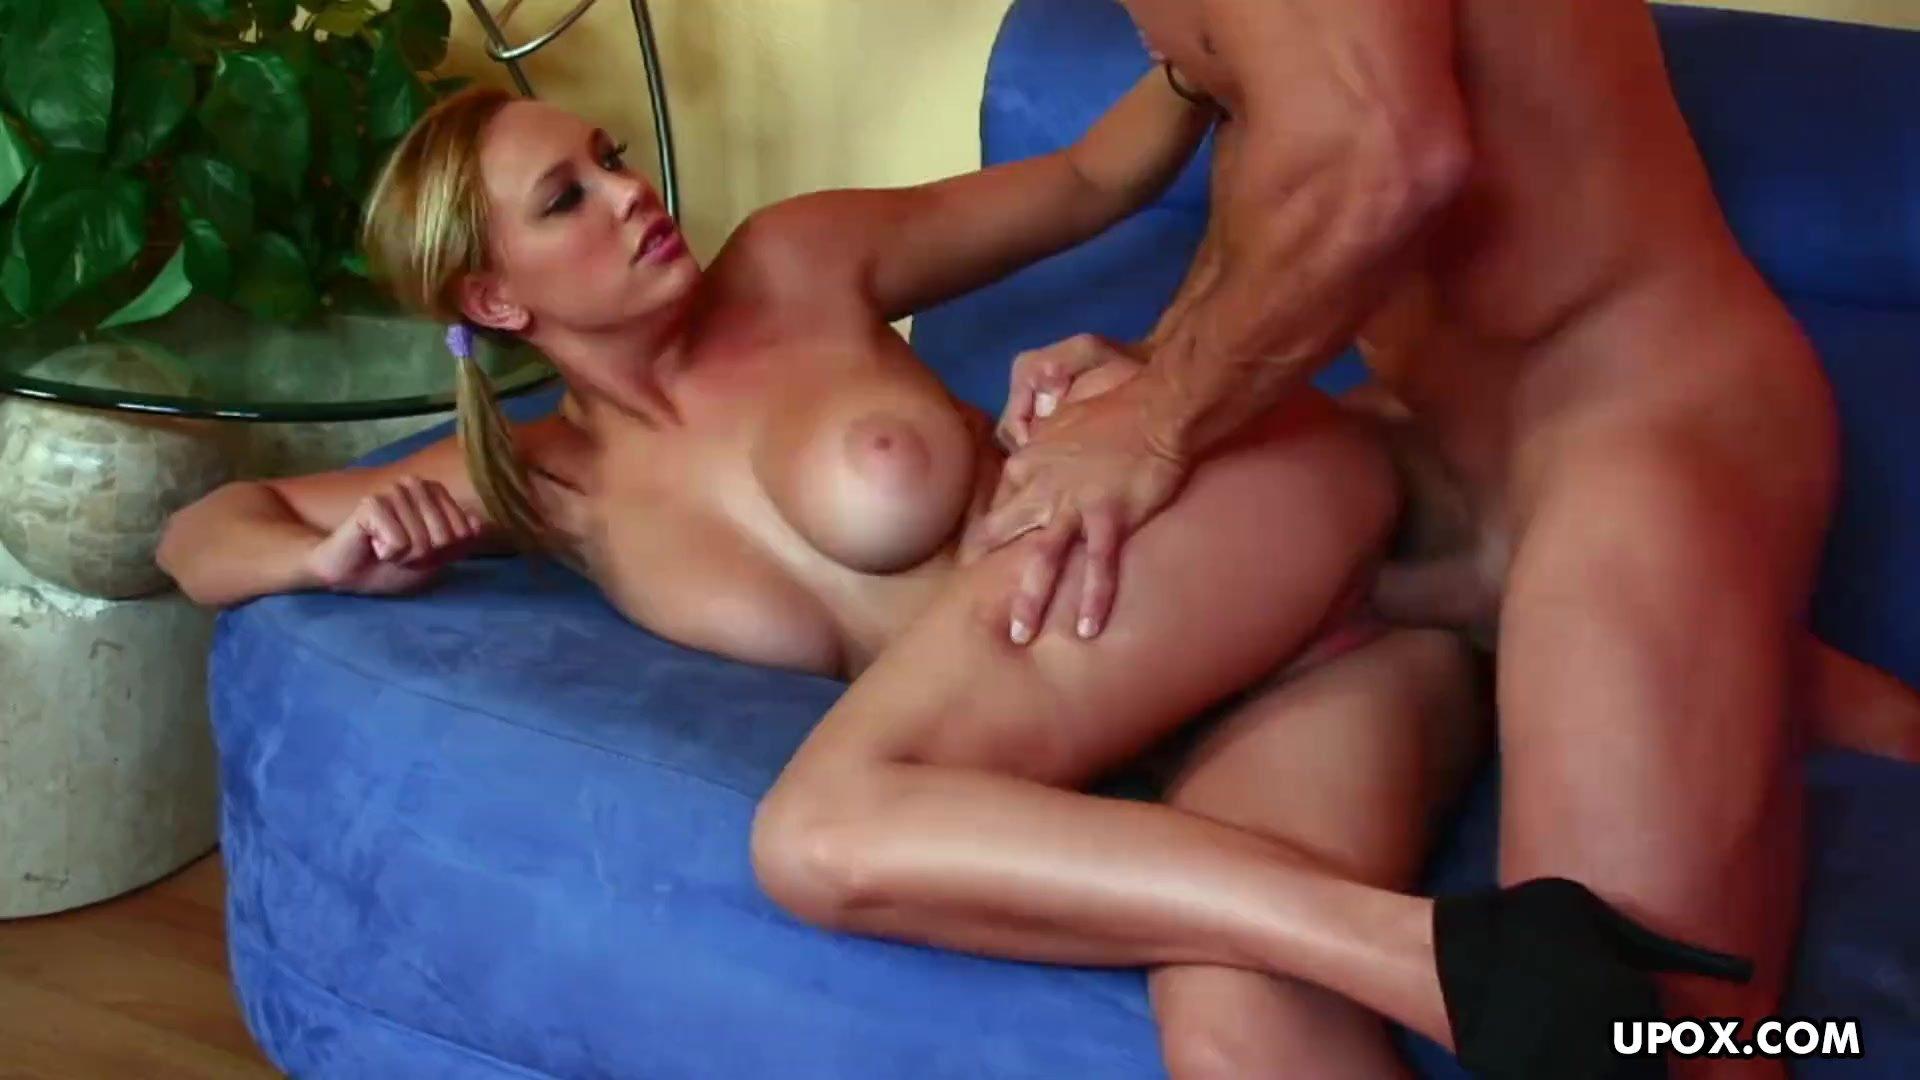 Busty blonde honey, Alexia Rae had hardcore sex, in 4K